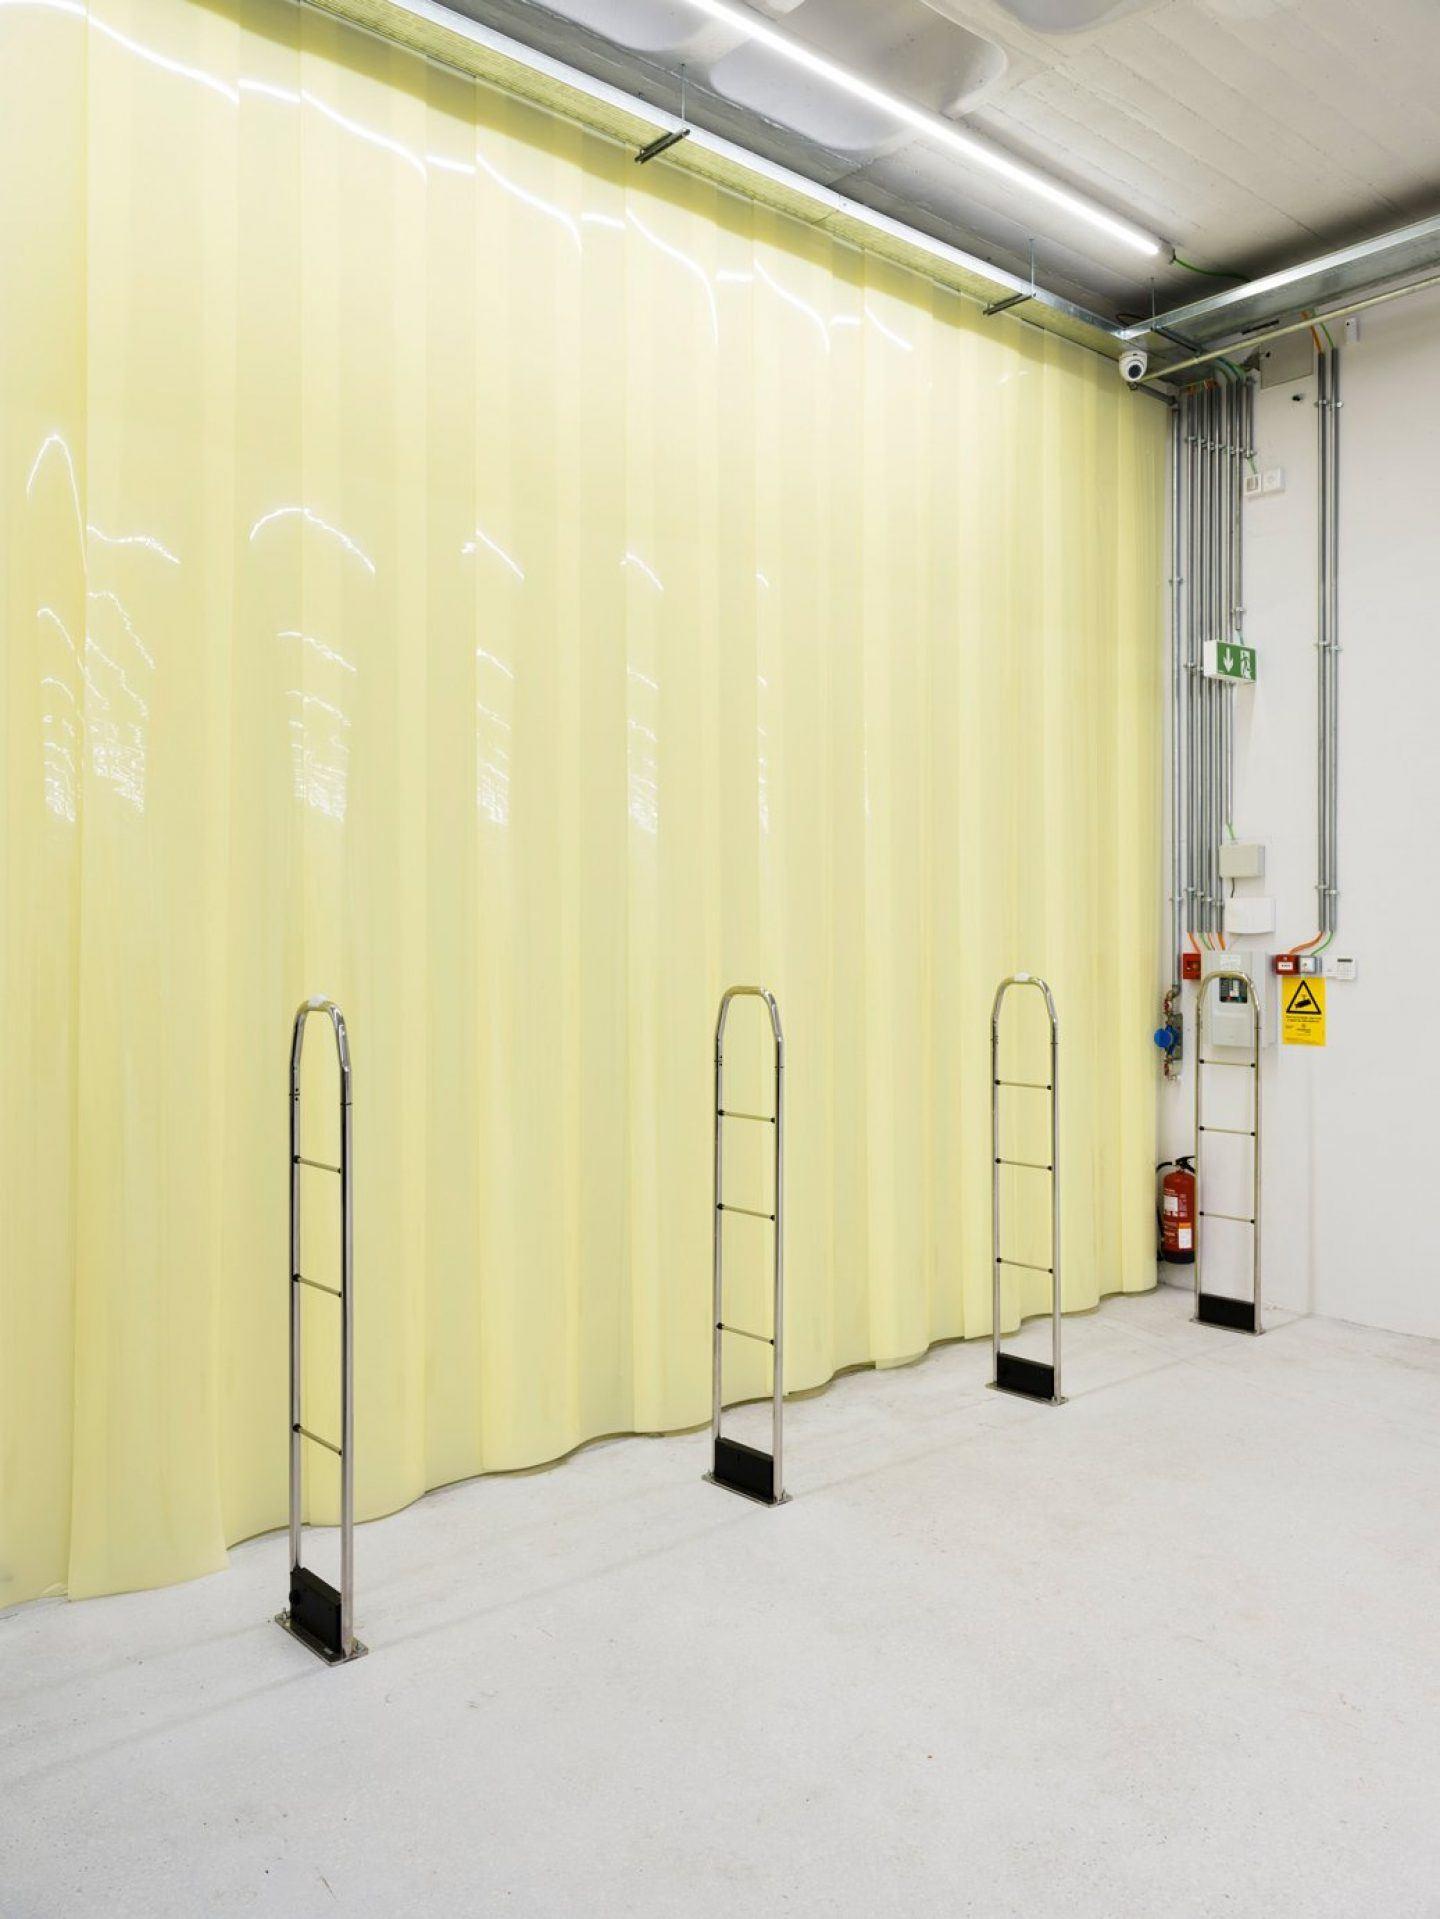 IGNANT-Architecture-Gonzalez-Haas-Tem-Plate-002